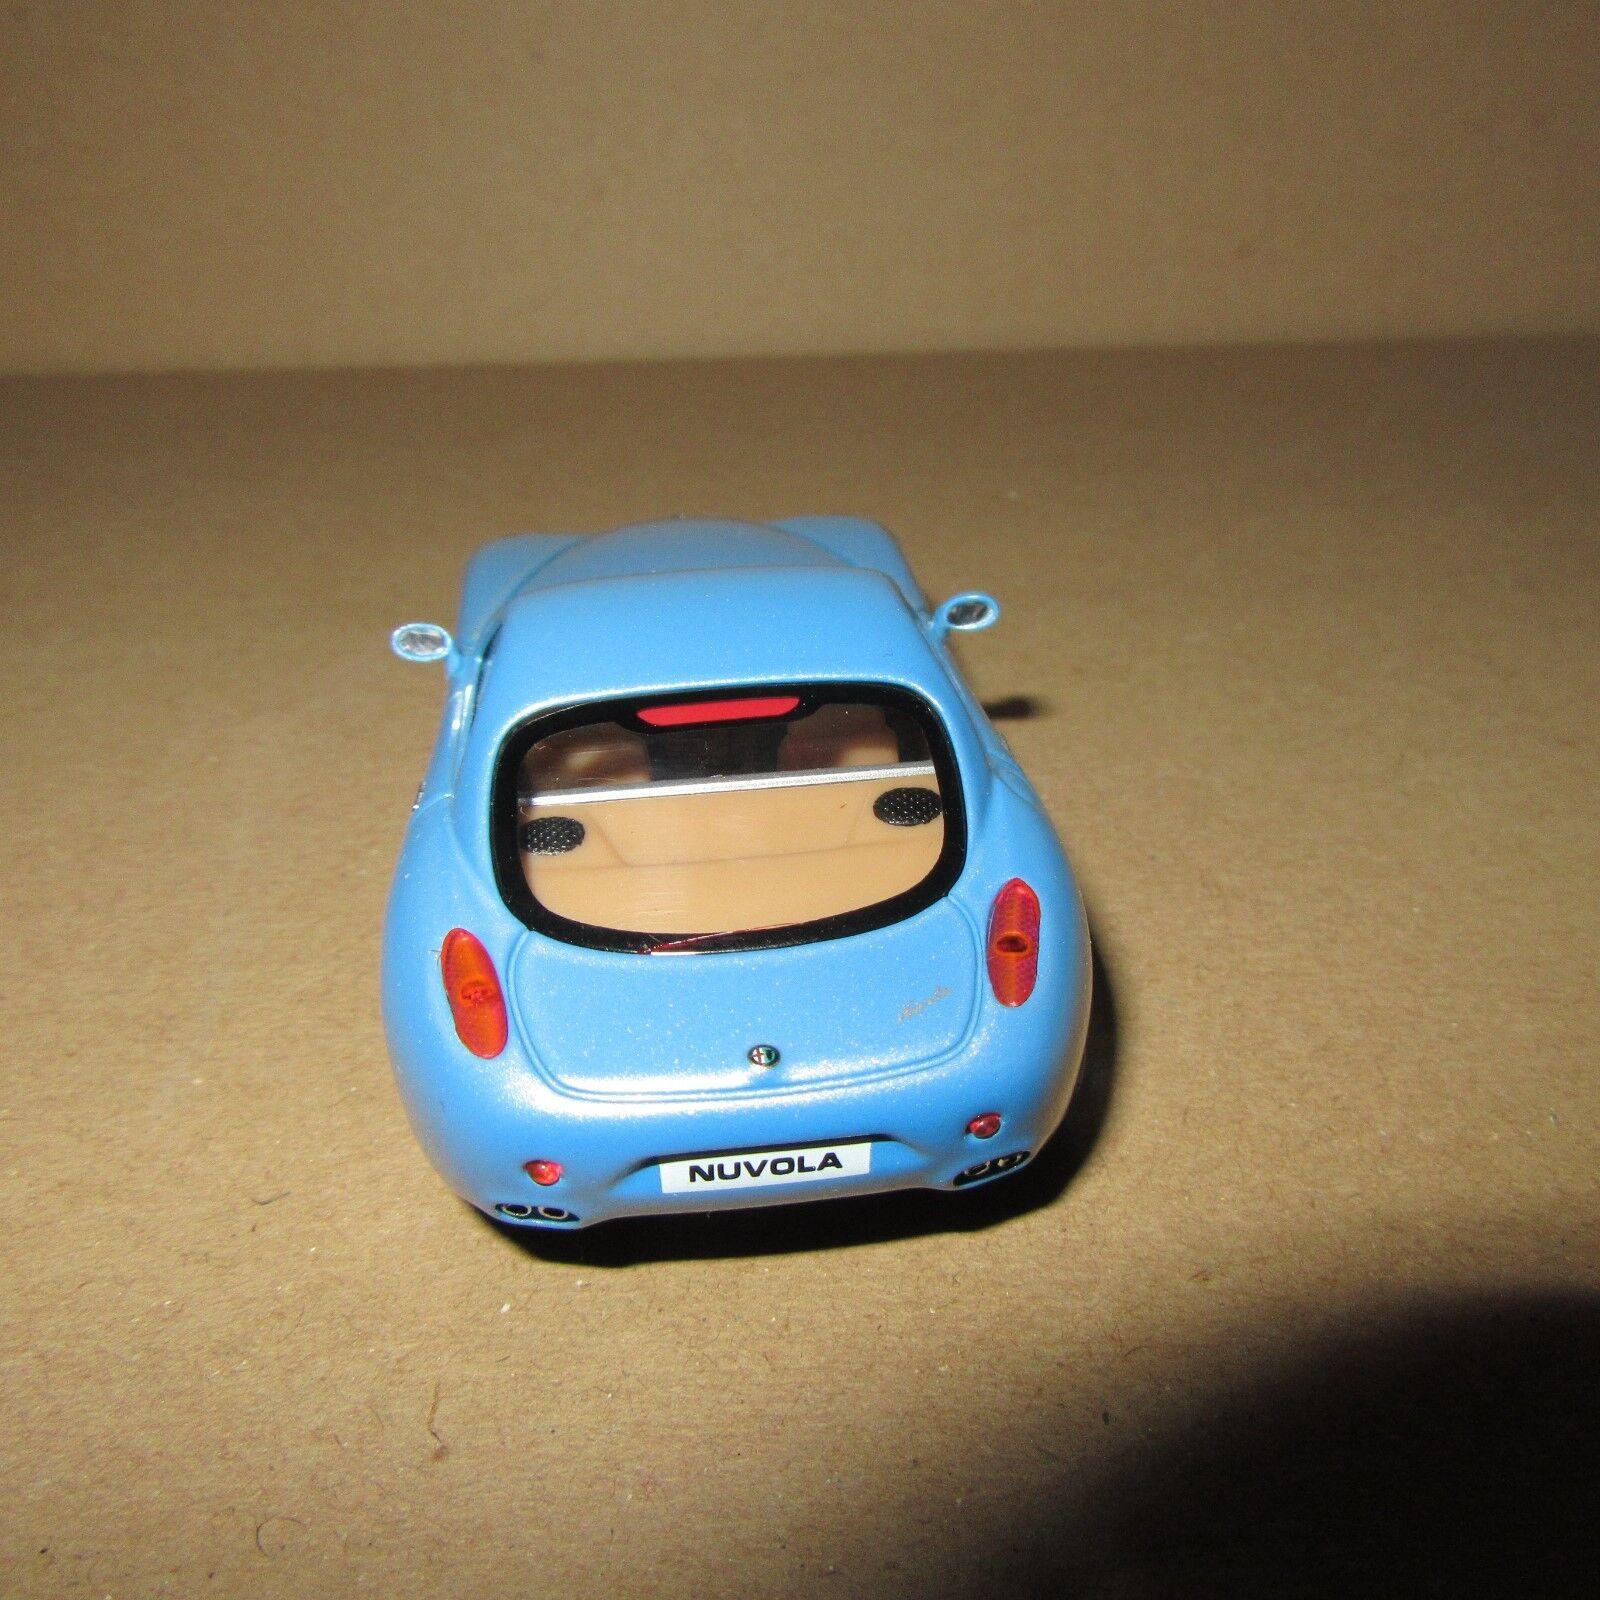 4F Solido 1556 Alfa Nuvola 1999 Coupé Coupé Coupé 1 43 898195